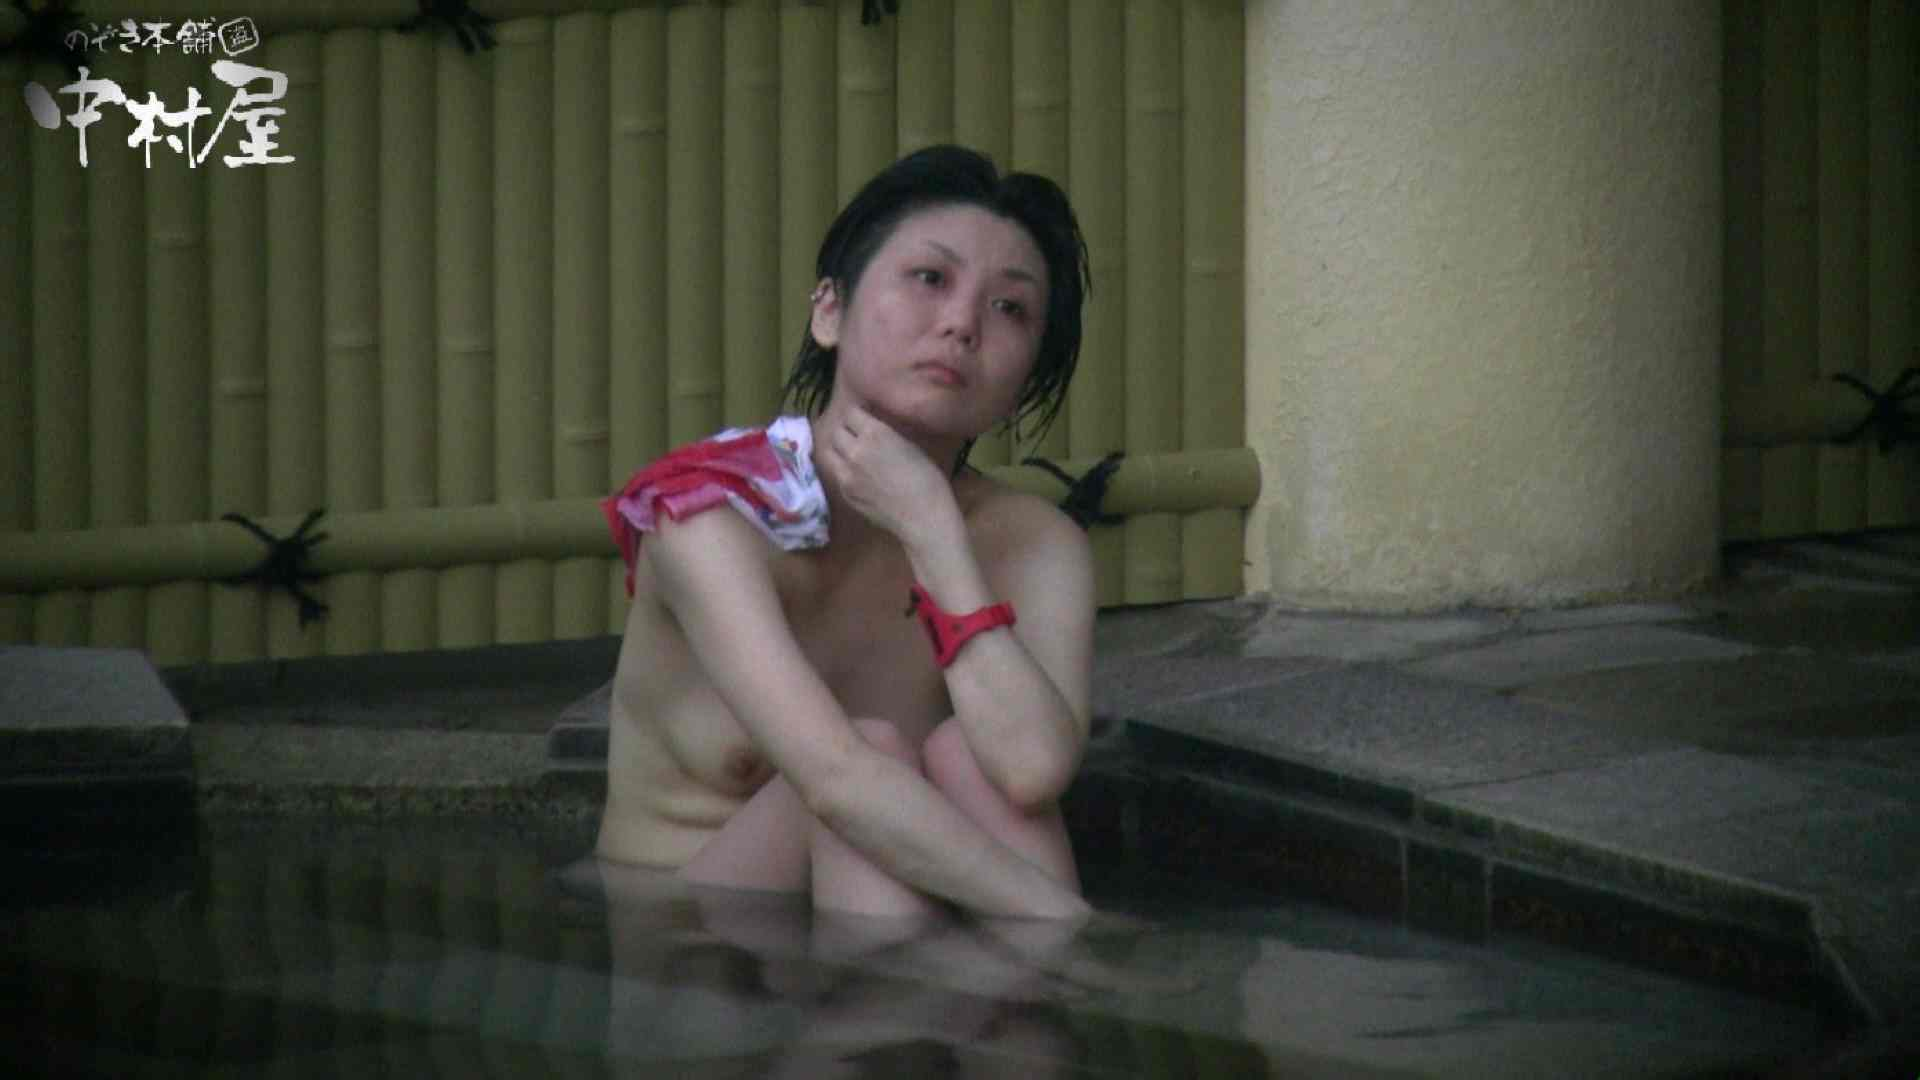 Aquaな露天風呂Vol.884 綺麗なOLたち  80枚 72